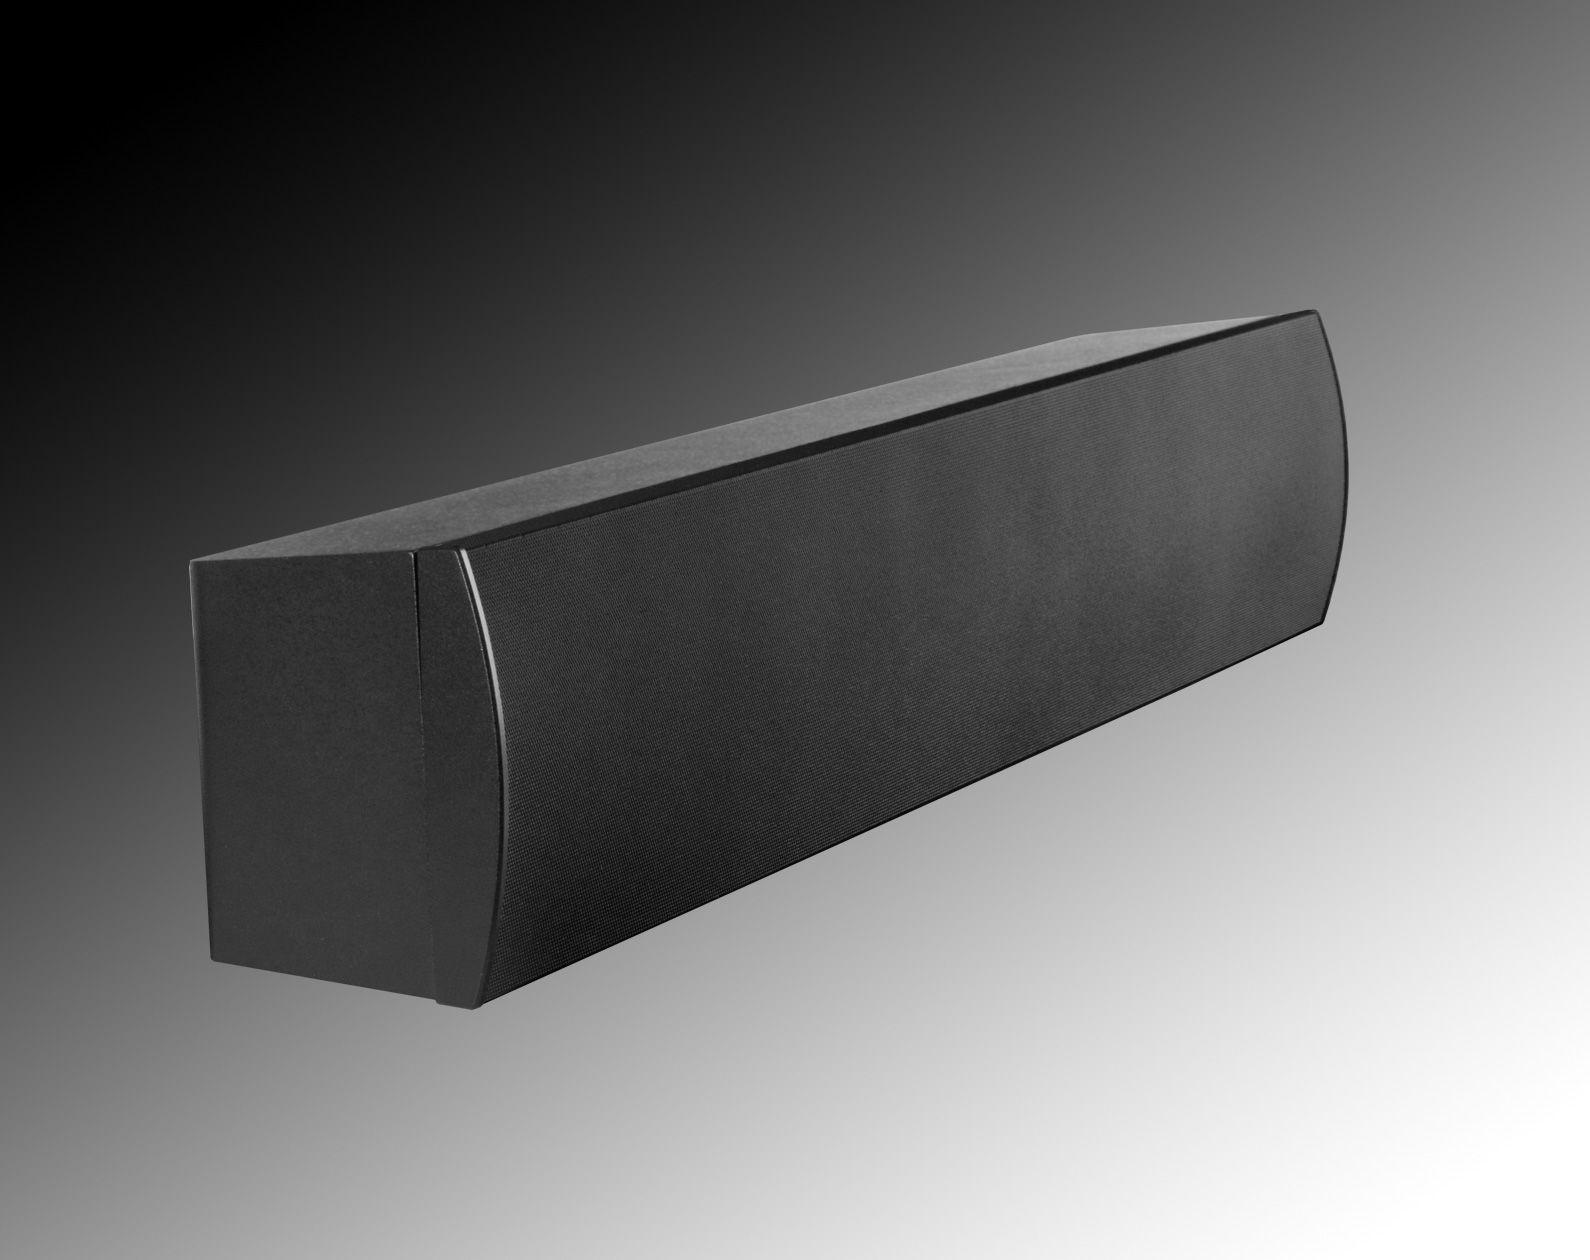 ONWALL MINI LCR 2.0 triad speakers